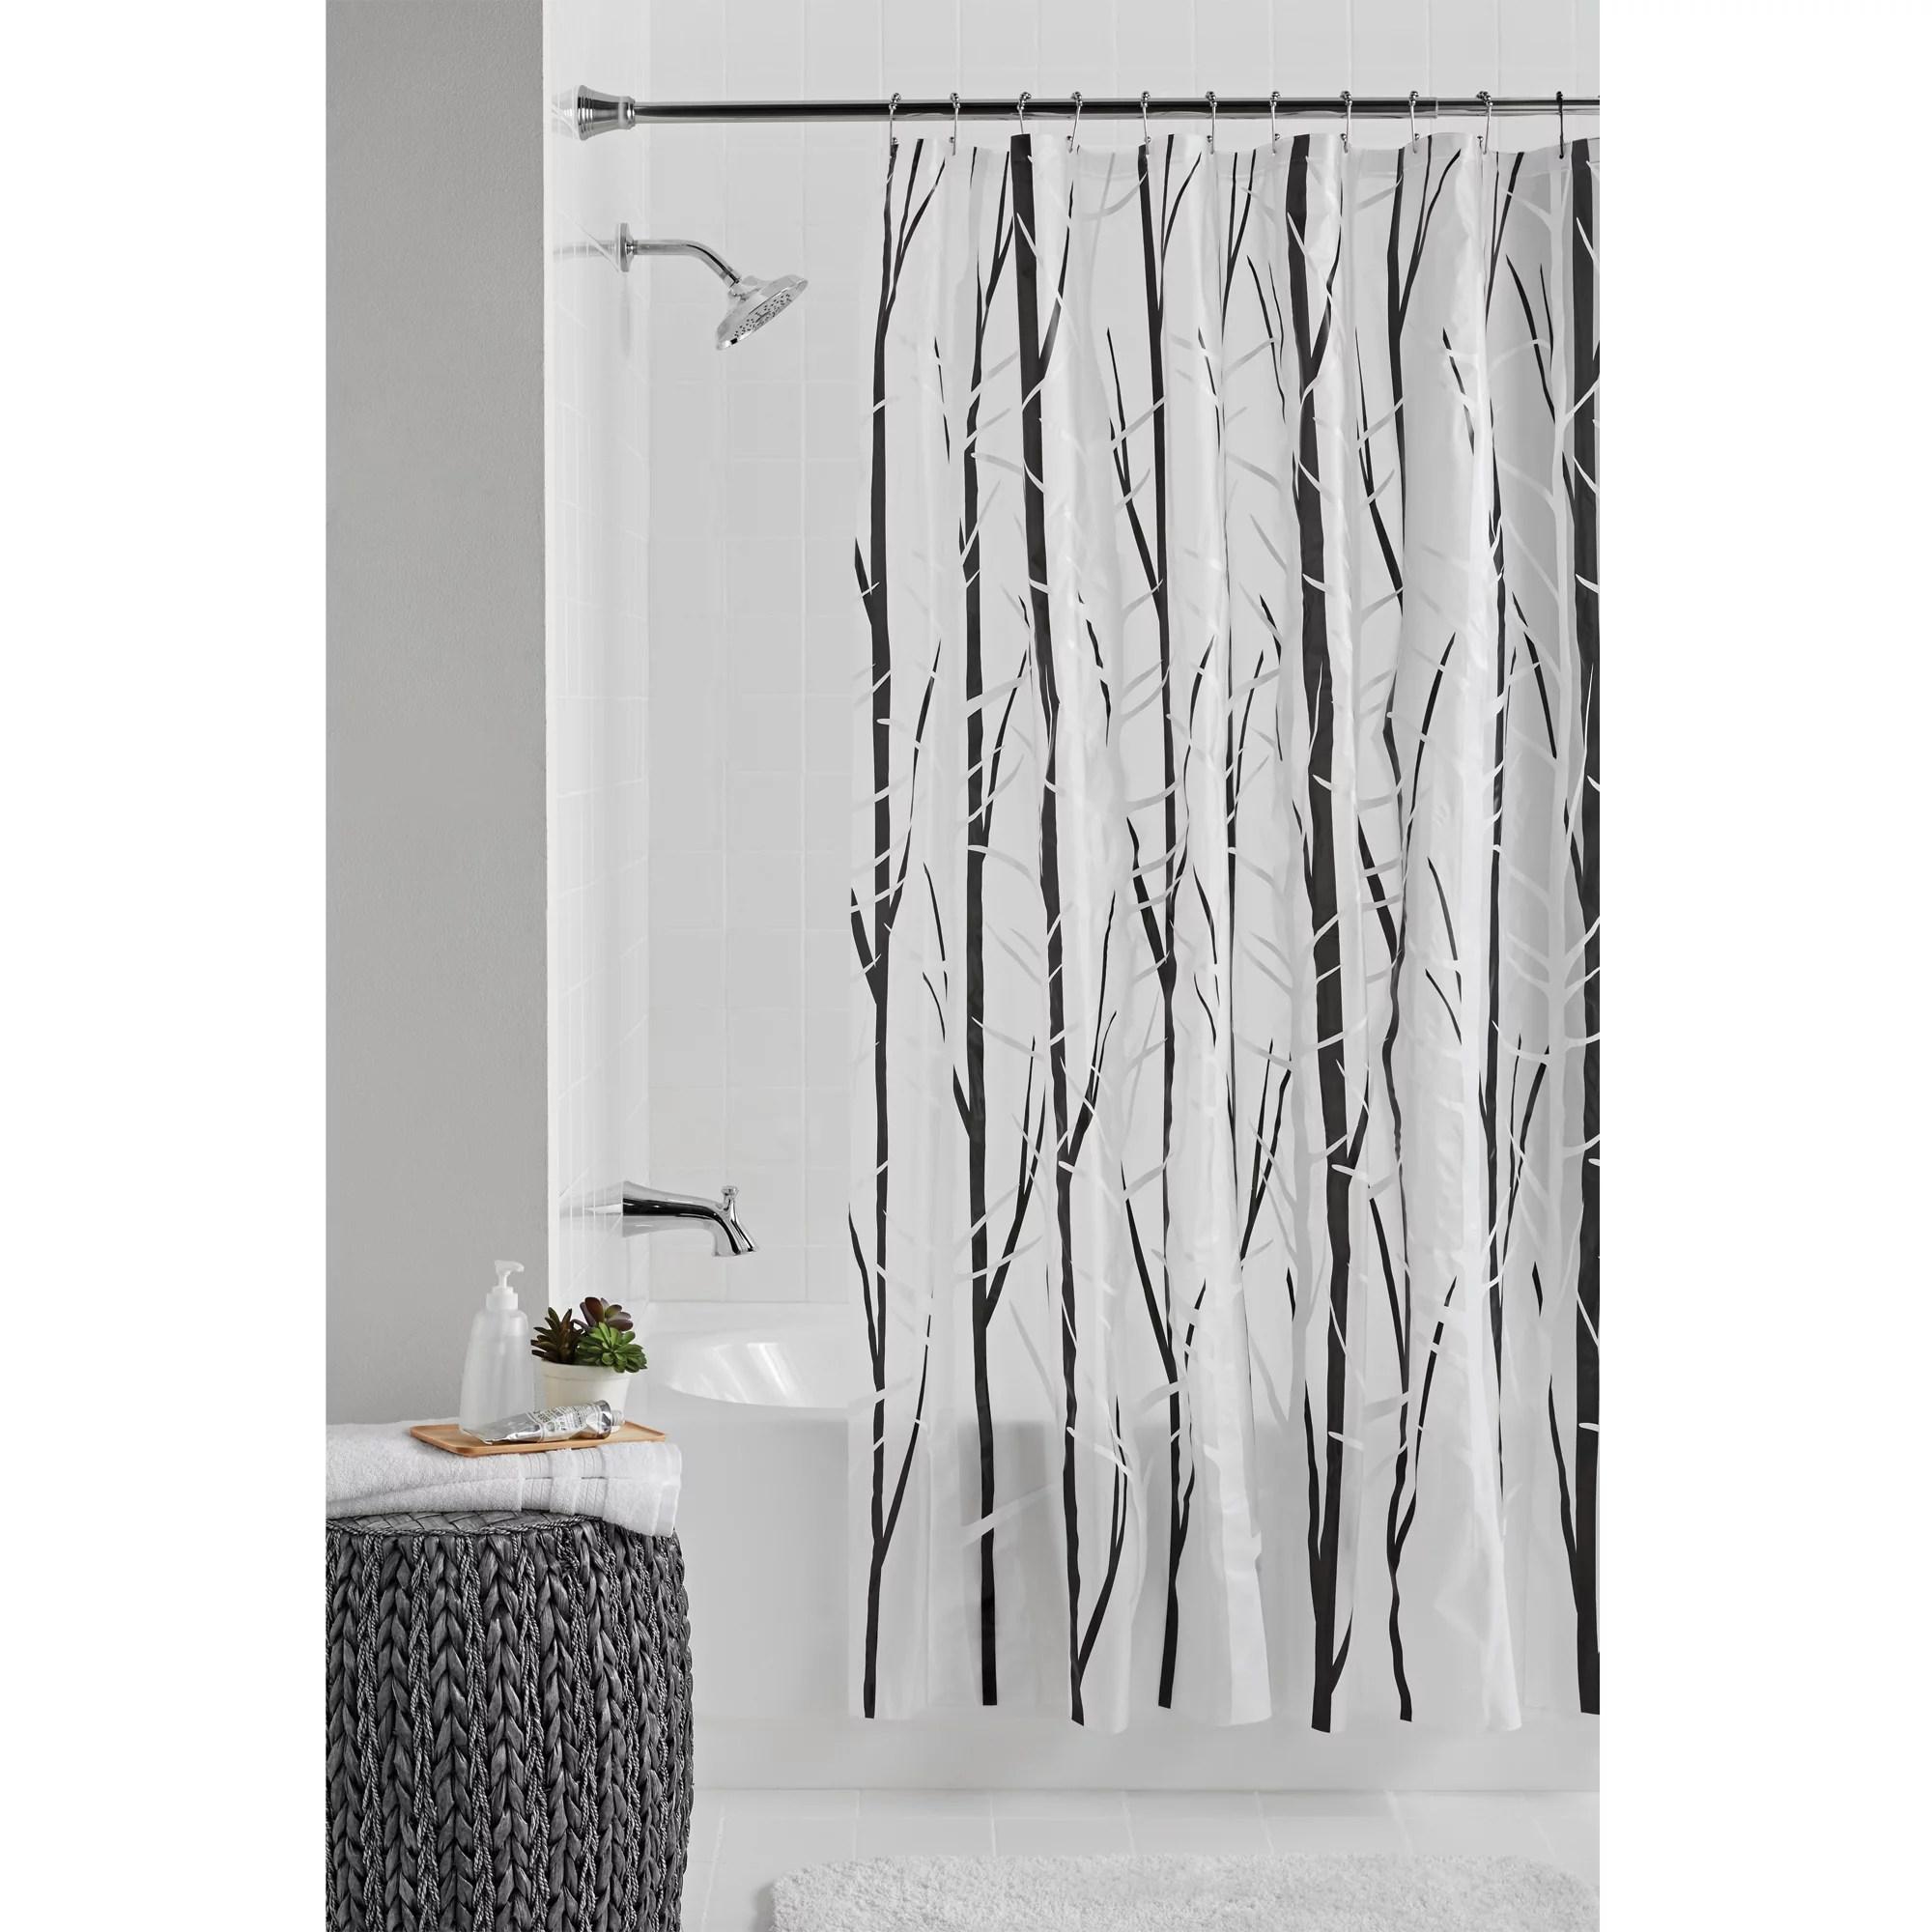 mainstays woodland 70 x 72 peva black white shower curtain or liner